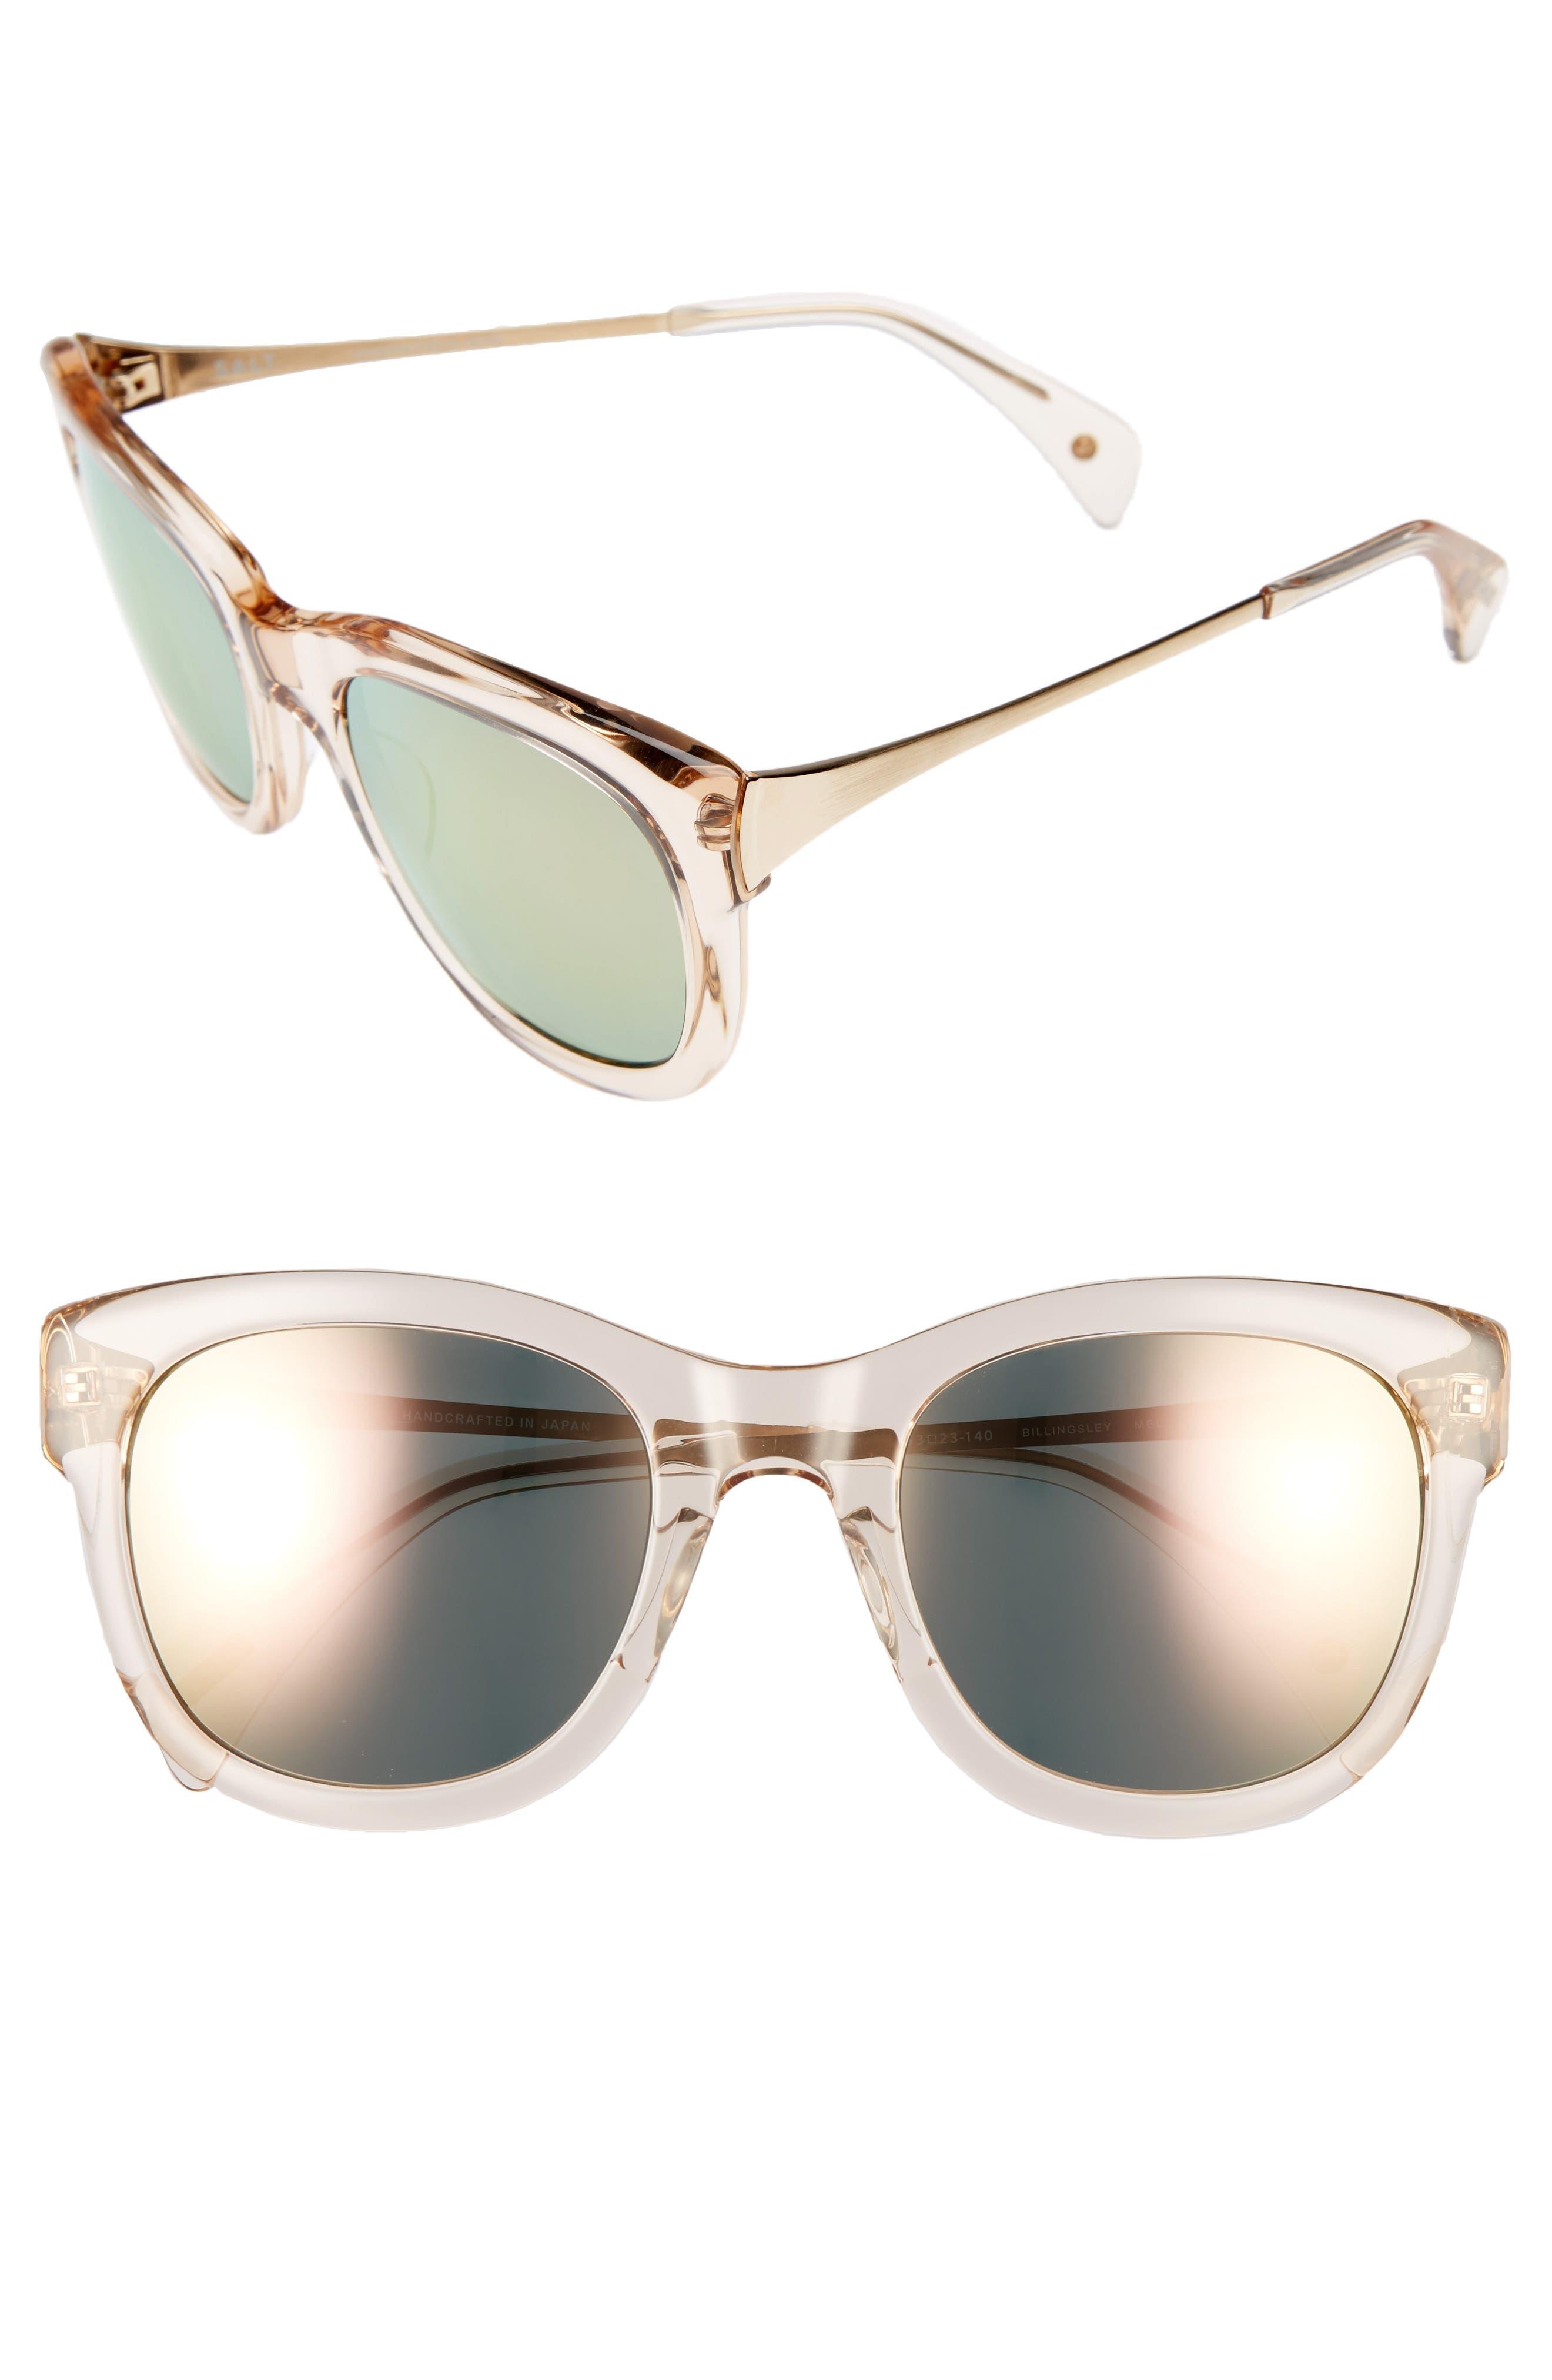 Billingsley 53mm Polarized Rectangular Sunglasses,                             Main thumbnail 1, color,                             300